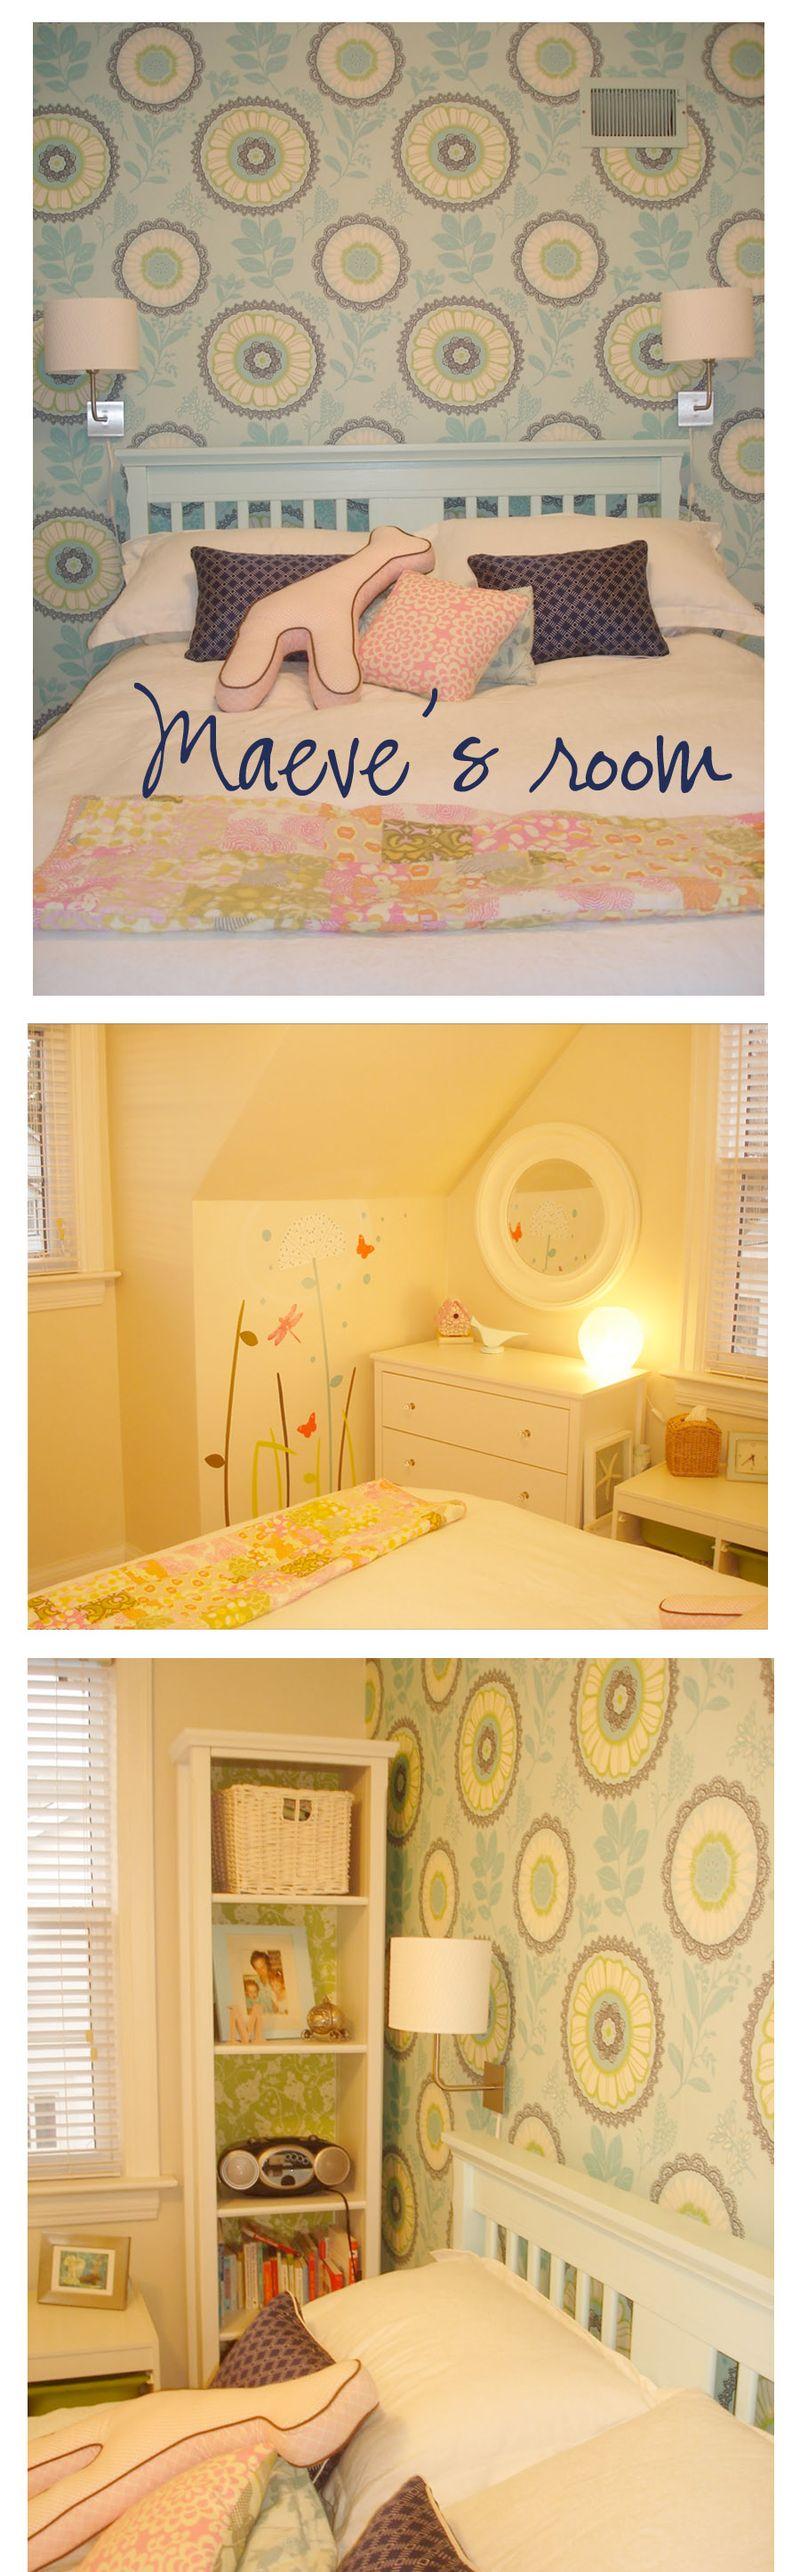 Maeve's room